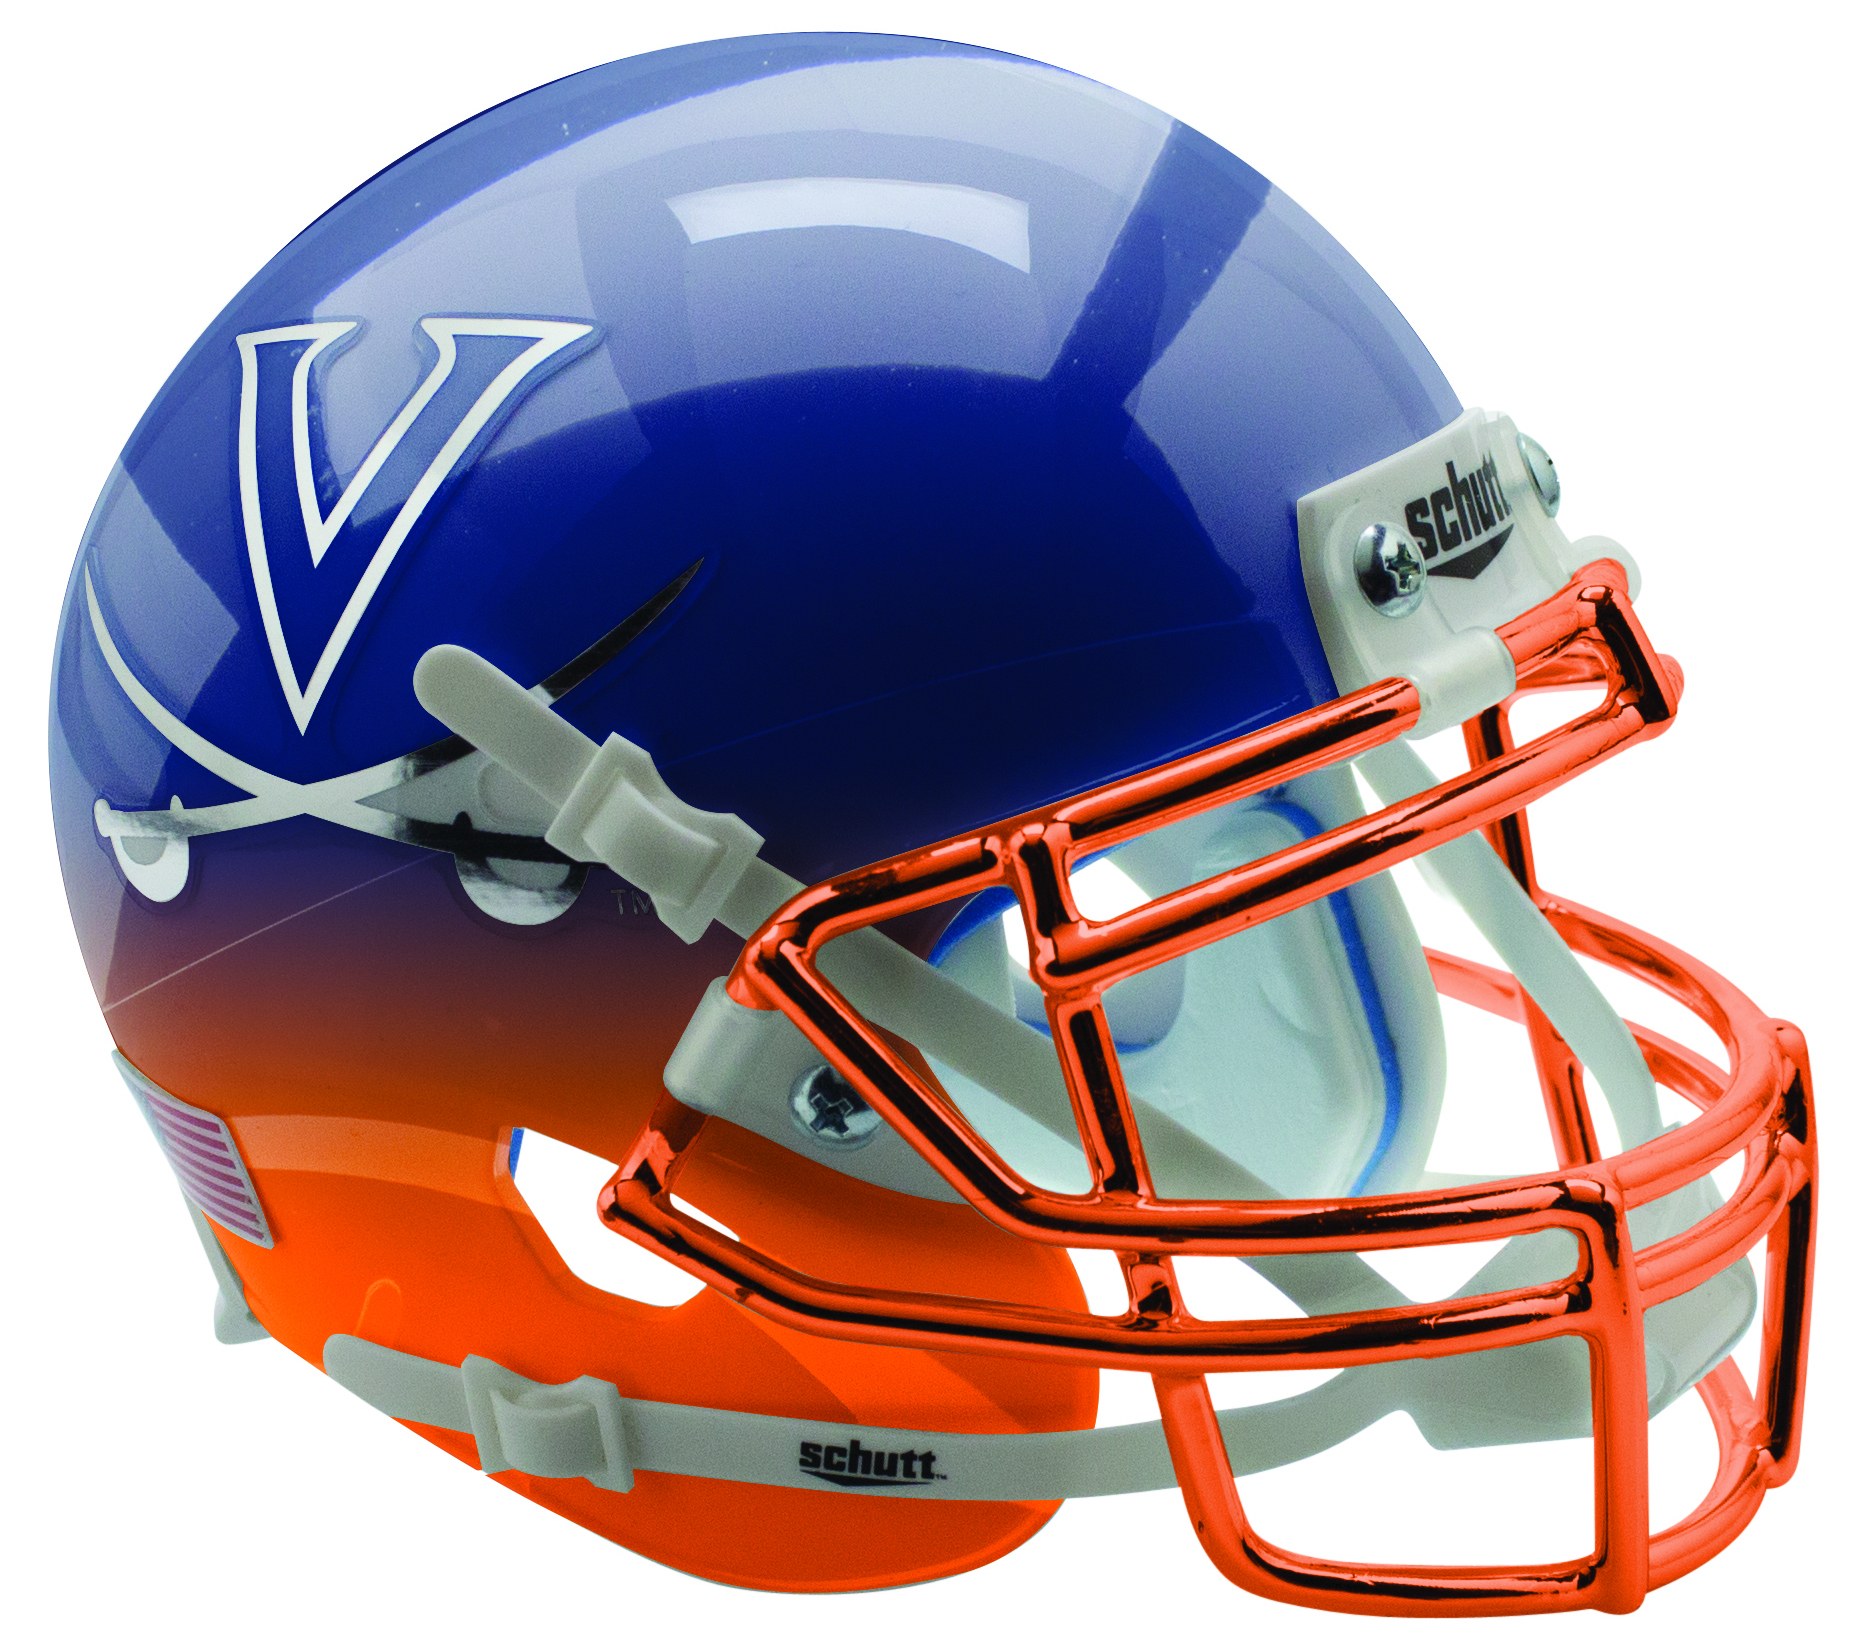 Virginia Cavaliers Authentic College XP Football Helmet Schutt <B>Navy Orange Featherhead with Chrome Mask</B>